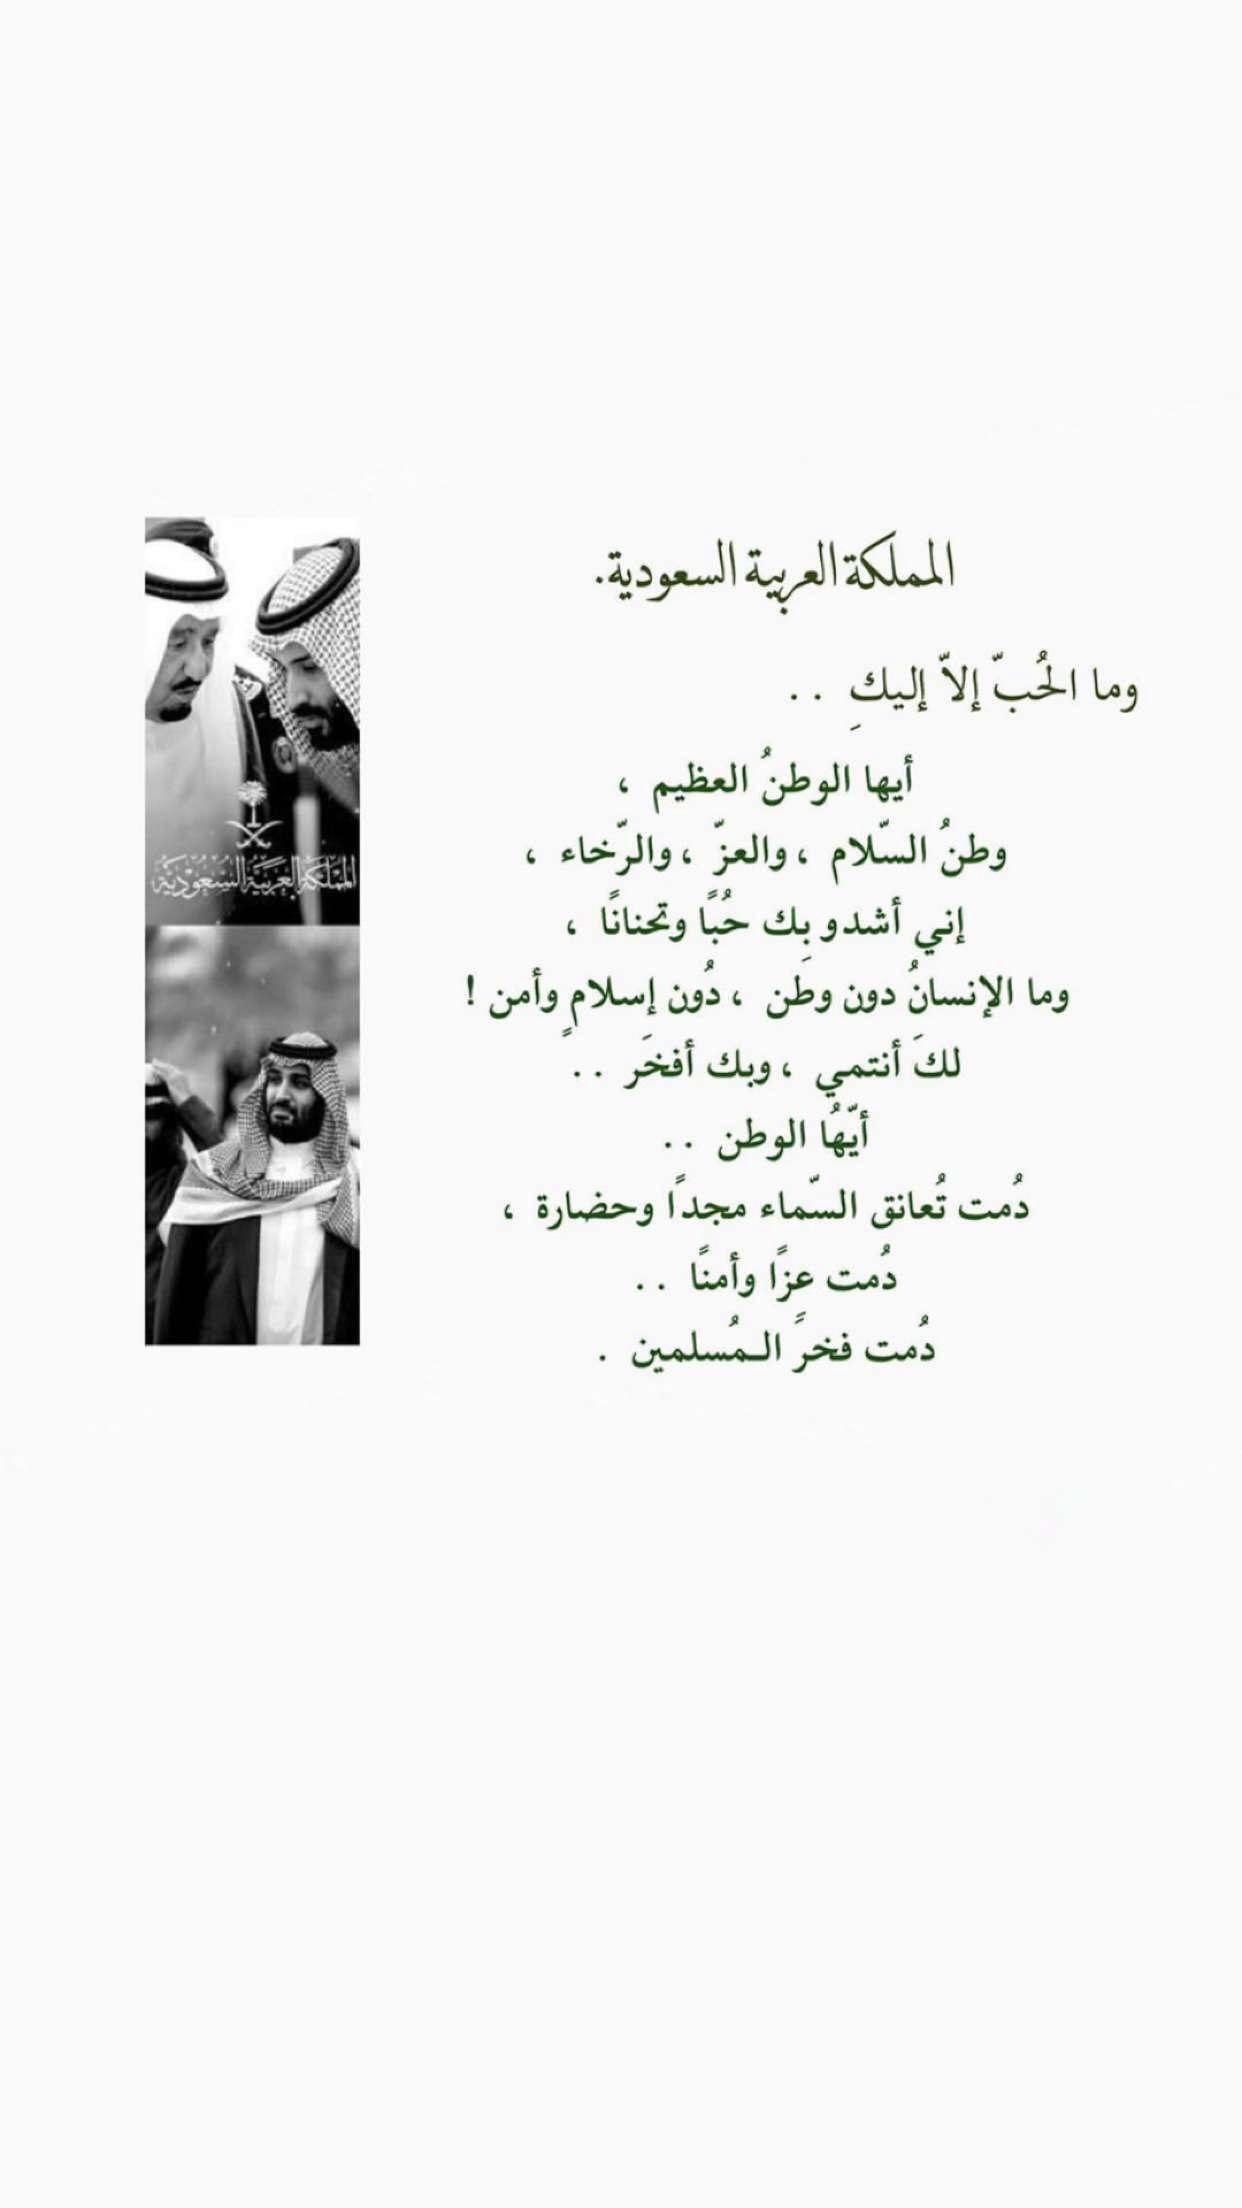 Pin By La On انجاز In 2020 Calligraphy Words National Day Saudi Ksa Saudi Arabia